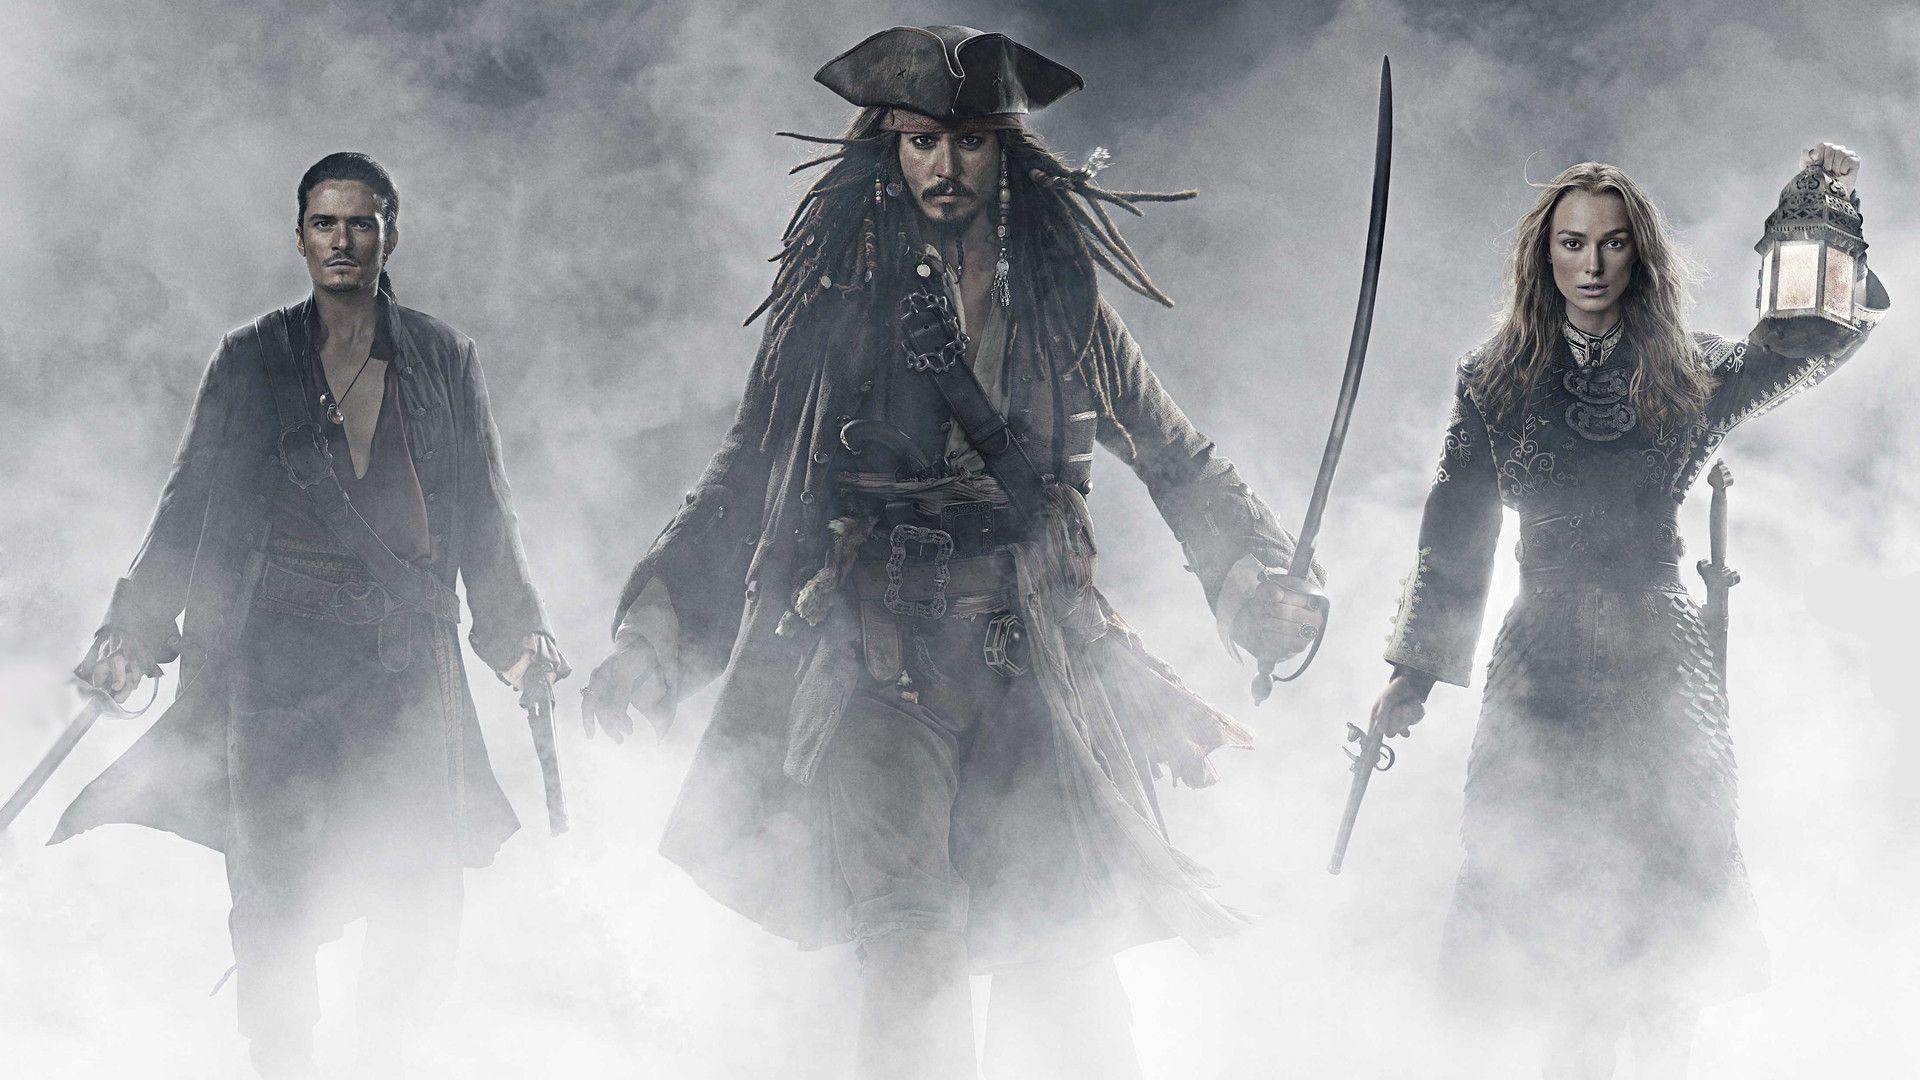 Pirates Of The Caribbean 4 Wallpaper Download #5576 Wallpaper .